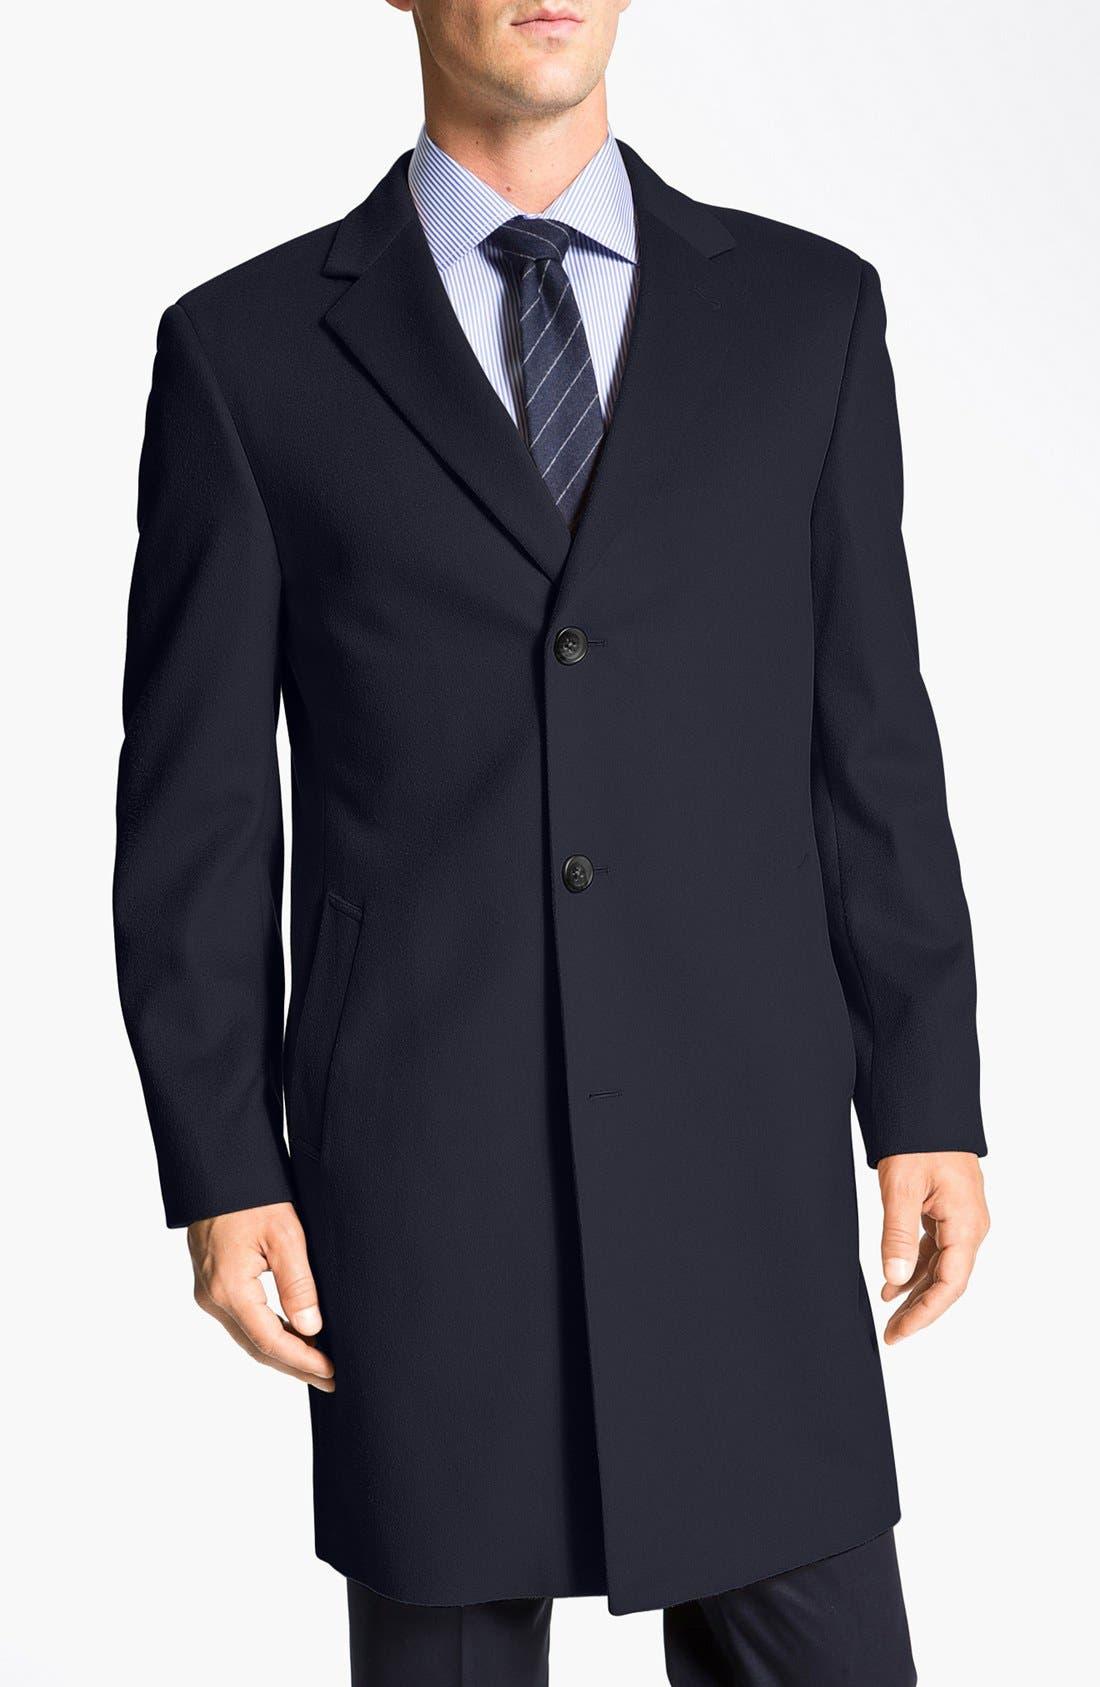 Alternate Image 1 Selected - John W. Nordstrom® Sydney Topcoat